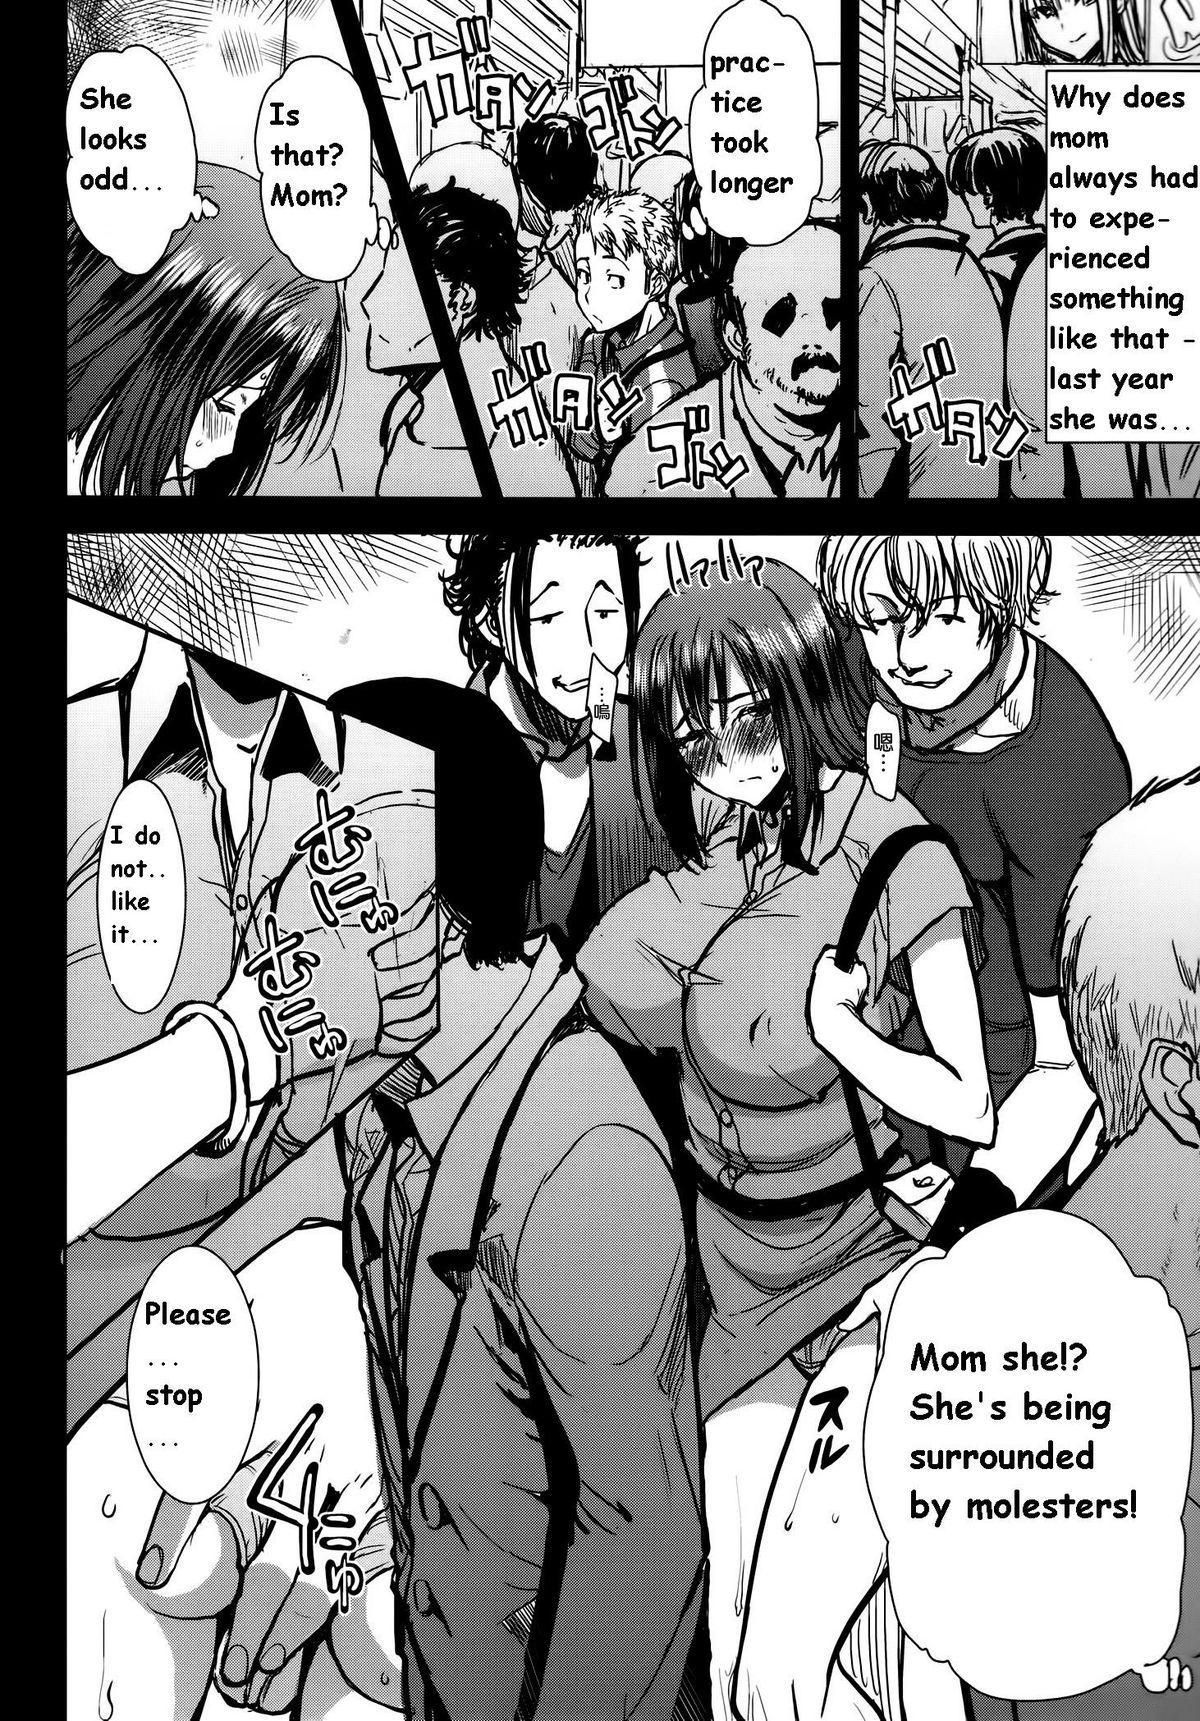 UnSweet Haha Wakui Kazumi Plus SIDE Hitori Musuko Ryousuke   Unsweet Mom Aimi Wakui - SIDE her only son Yoshisuke 13